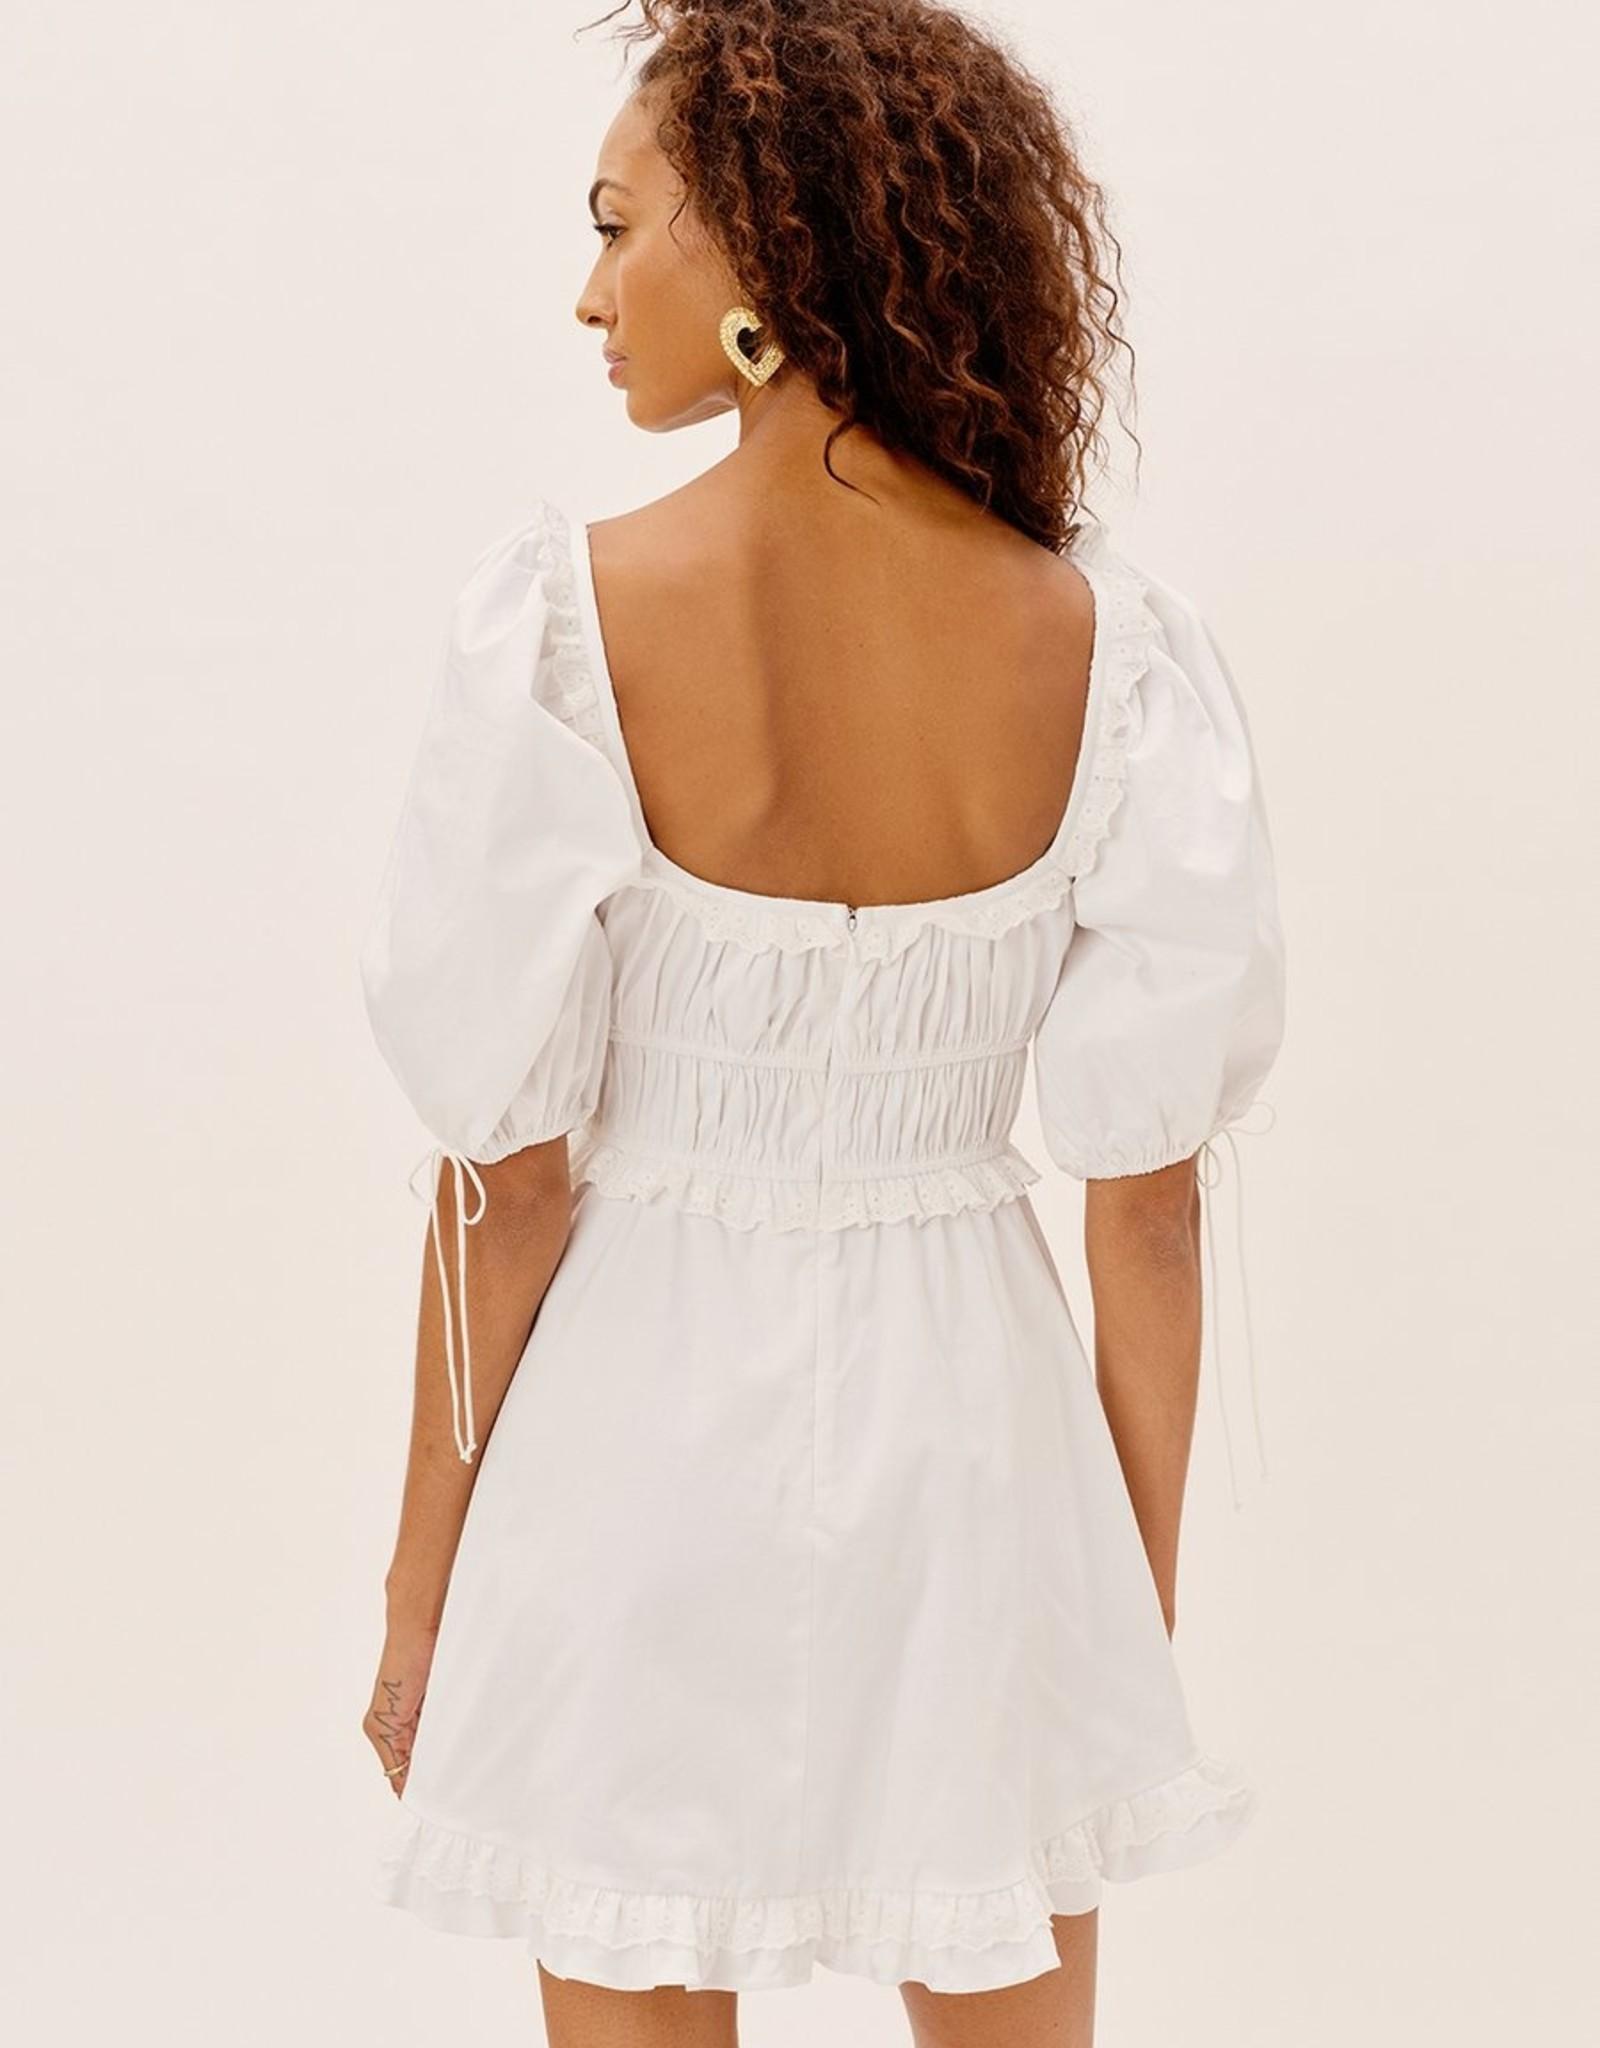 For Love and Lemon Jackson Mini Dress